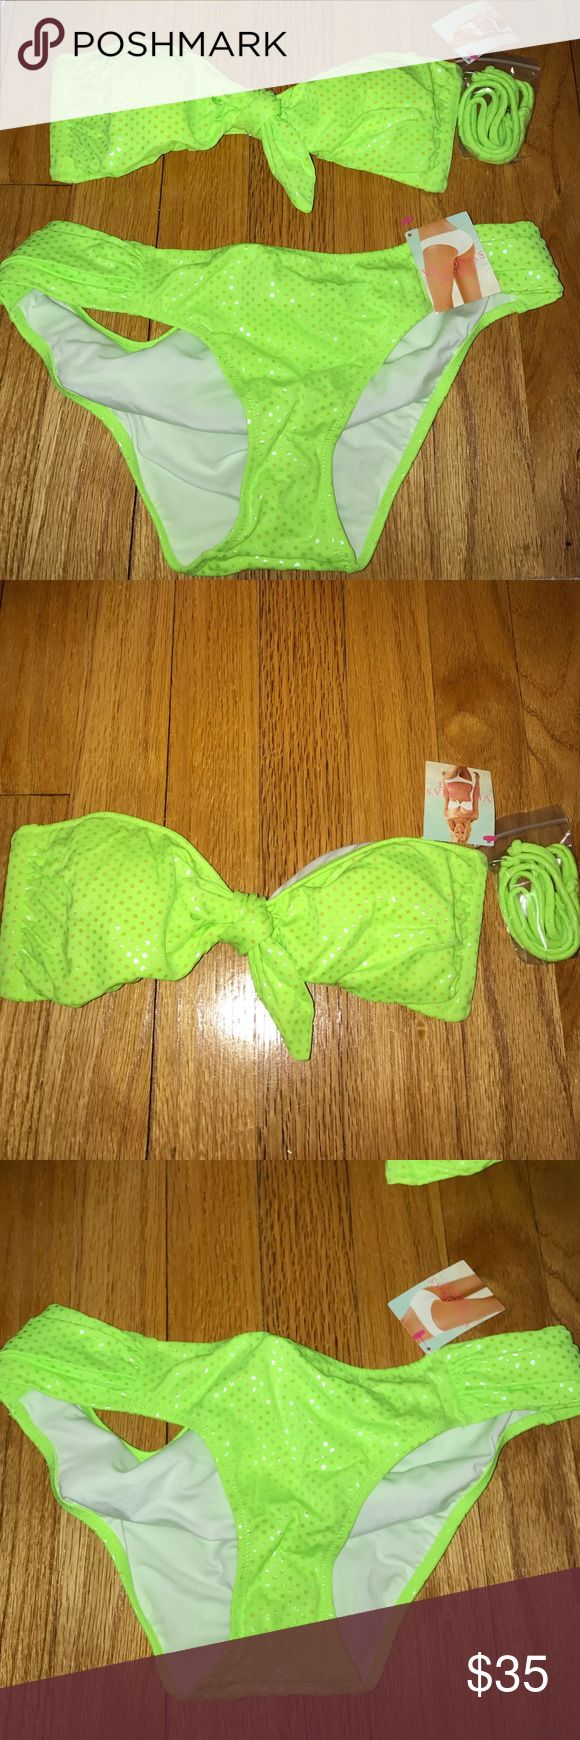 Victoria's Secret neon green sparkly bathing suit Victoria Secret bathing suit set; bandeau and bottoms. Top is a belle bandeau in size x-small and bottoms are hipkini fit in size small. NEGOTIABLE Victoria's Secret Swim Bikinis